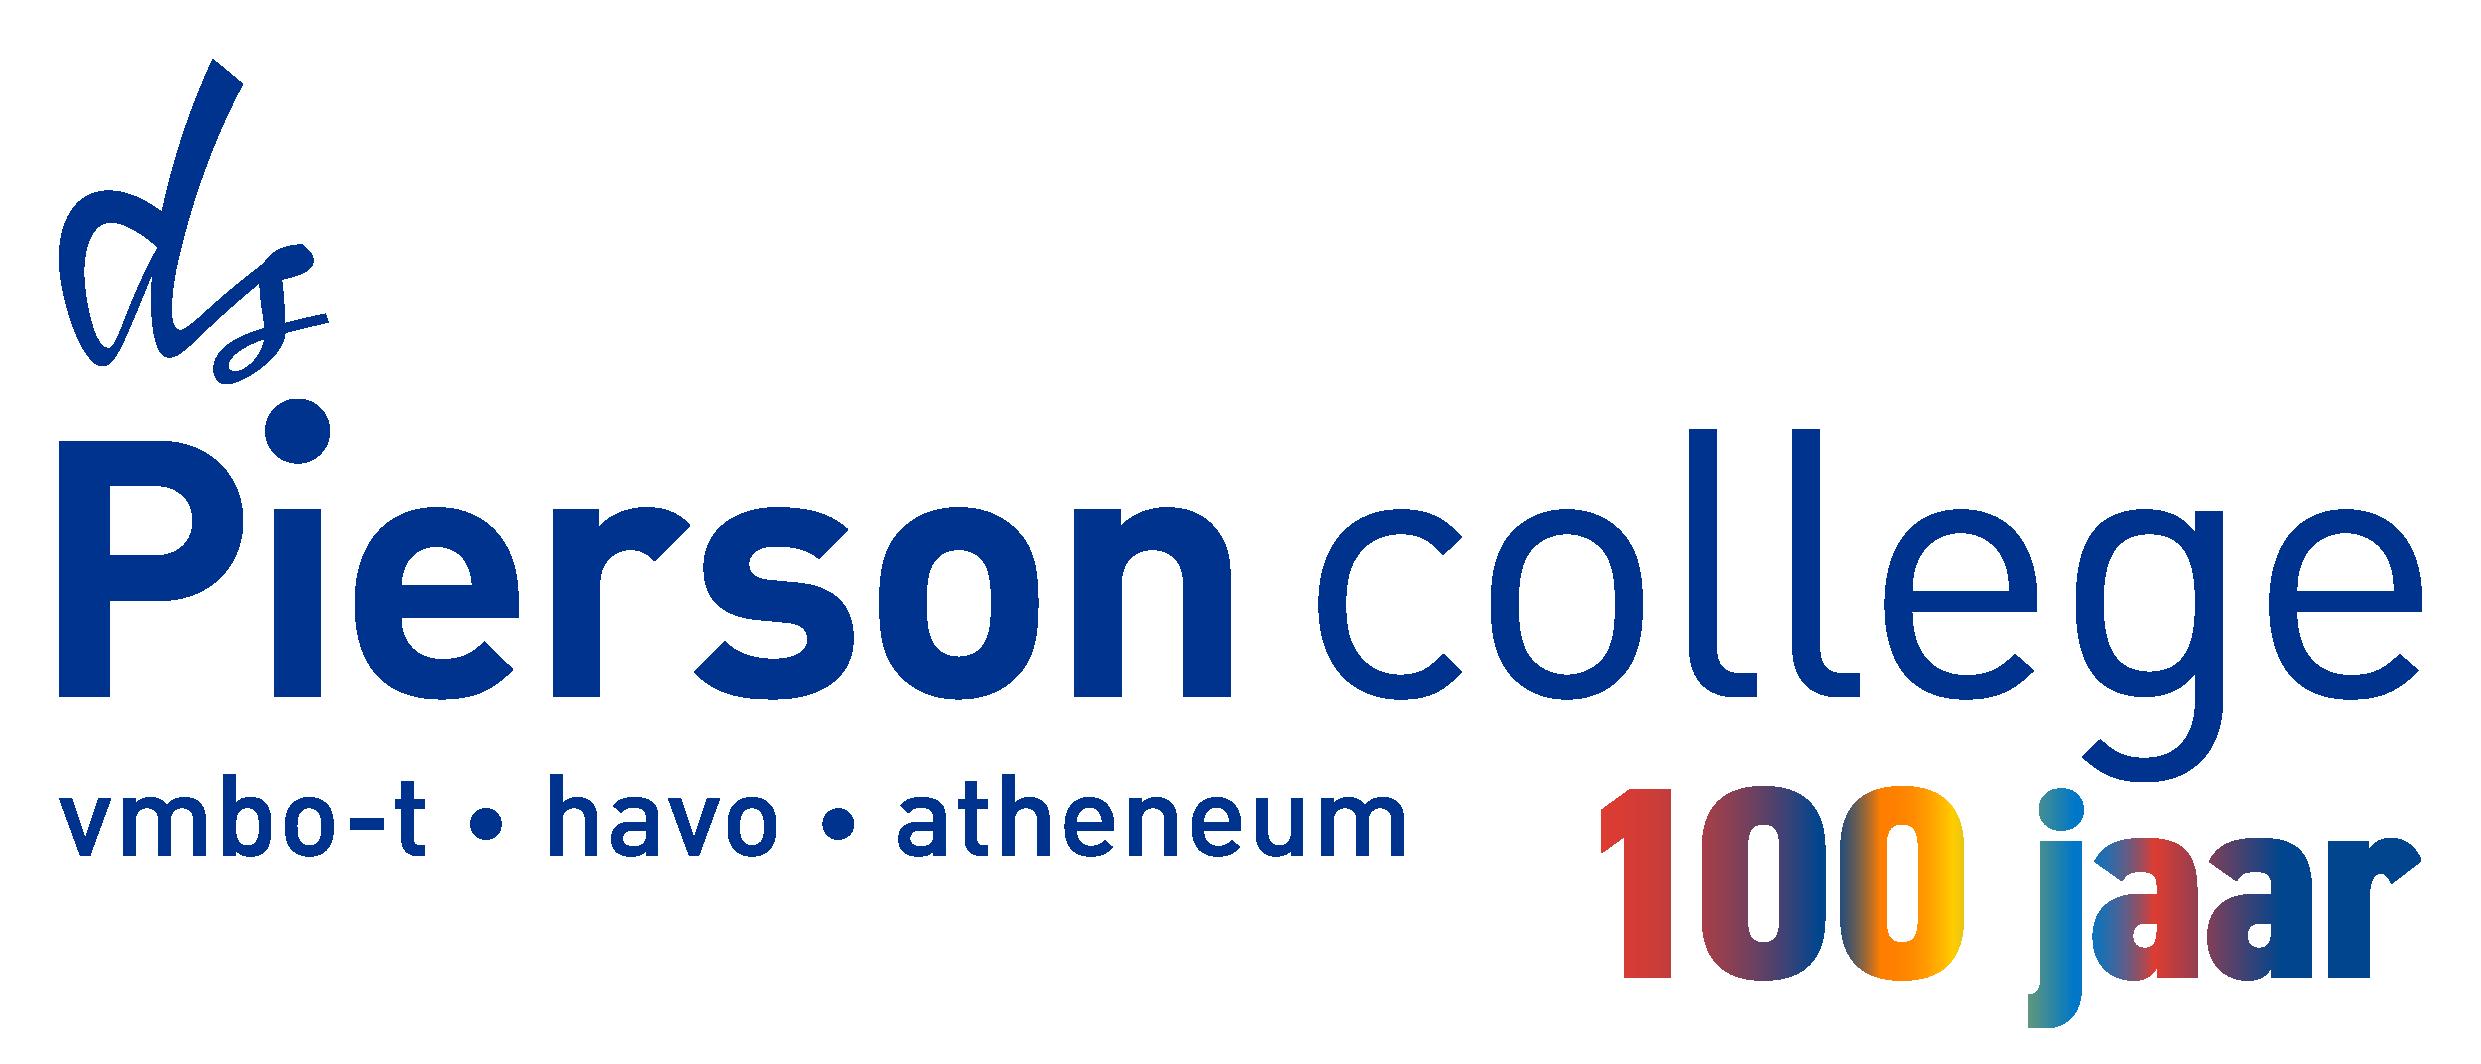 Pierson 100 jaar logo